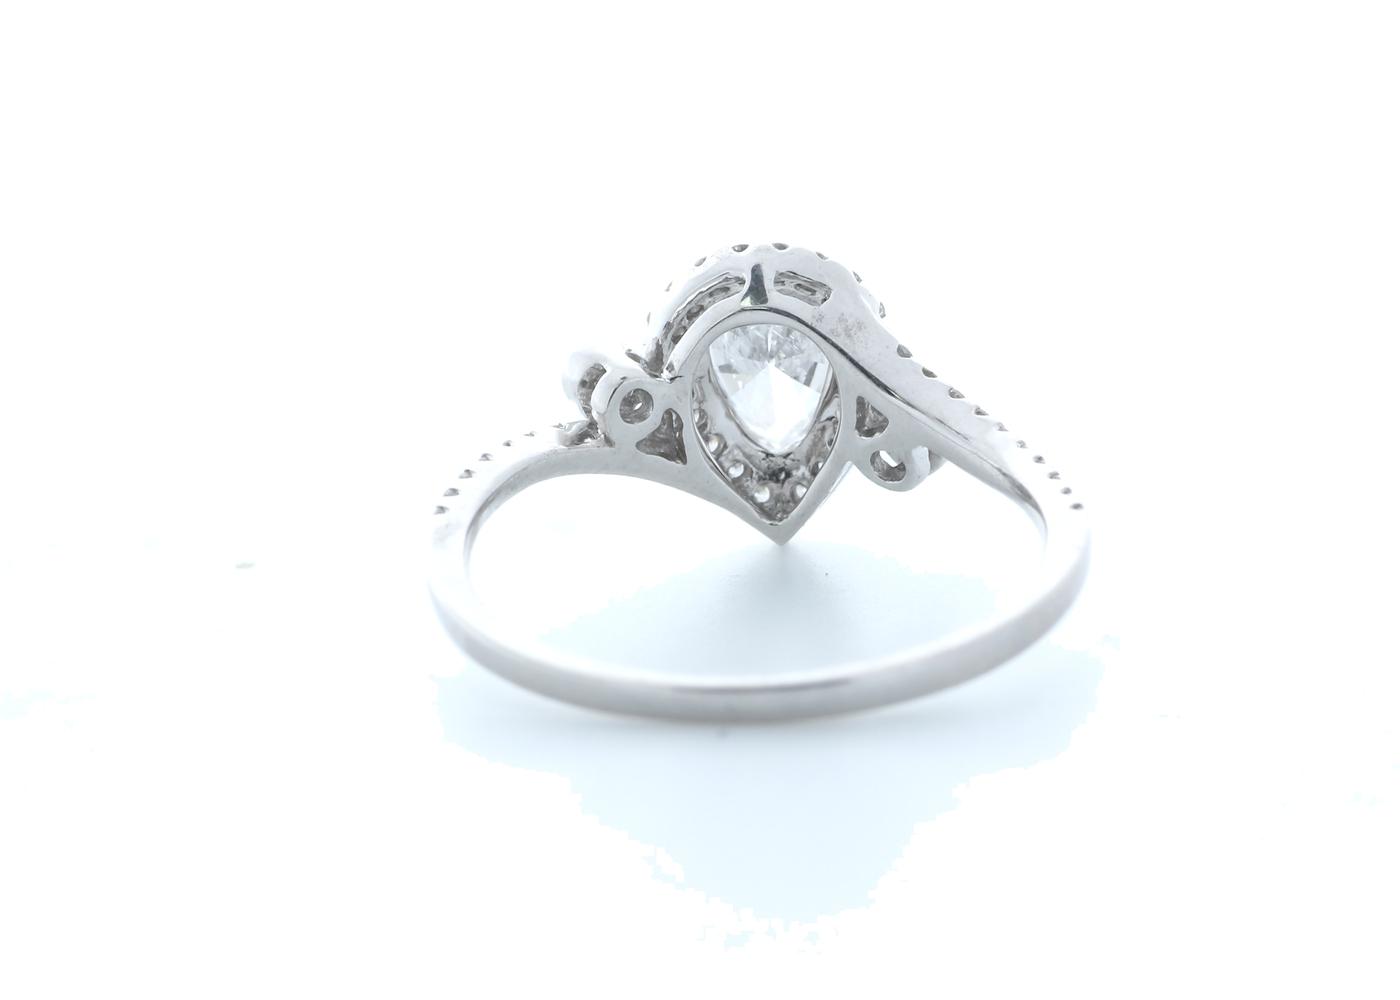 18ct White Gold Pear Shape Halo Diamond Ring 0.76 (0.51) Carats - Image 3 of 5